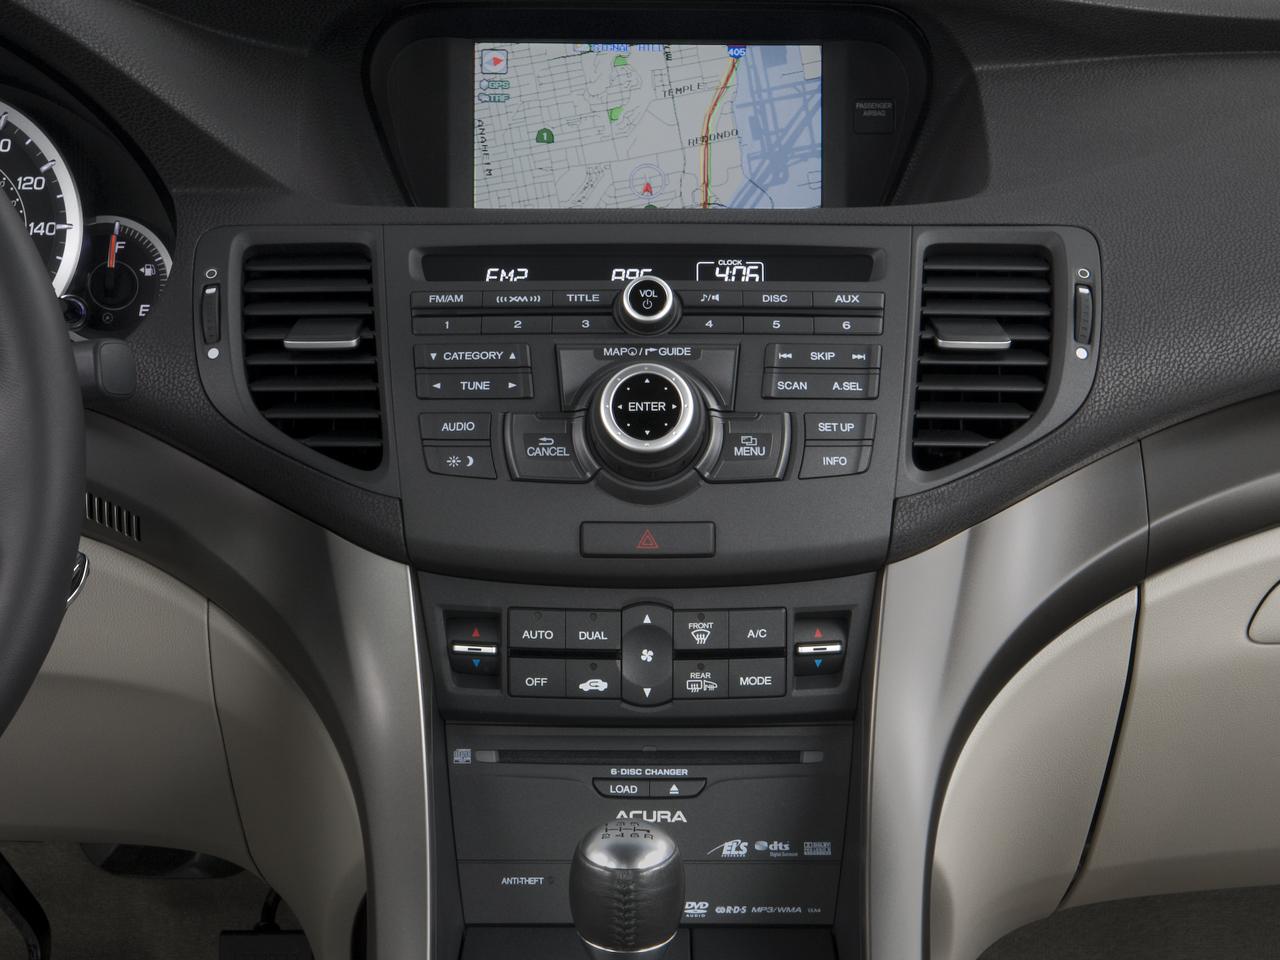 Acura Tsx Manual Browse Manual Guides - Acura tsx manual transmission